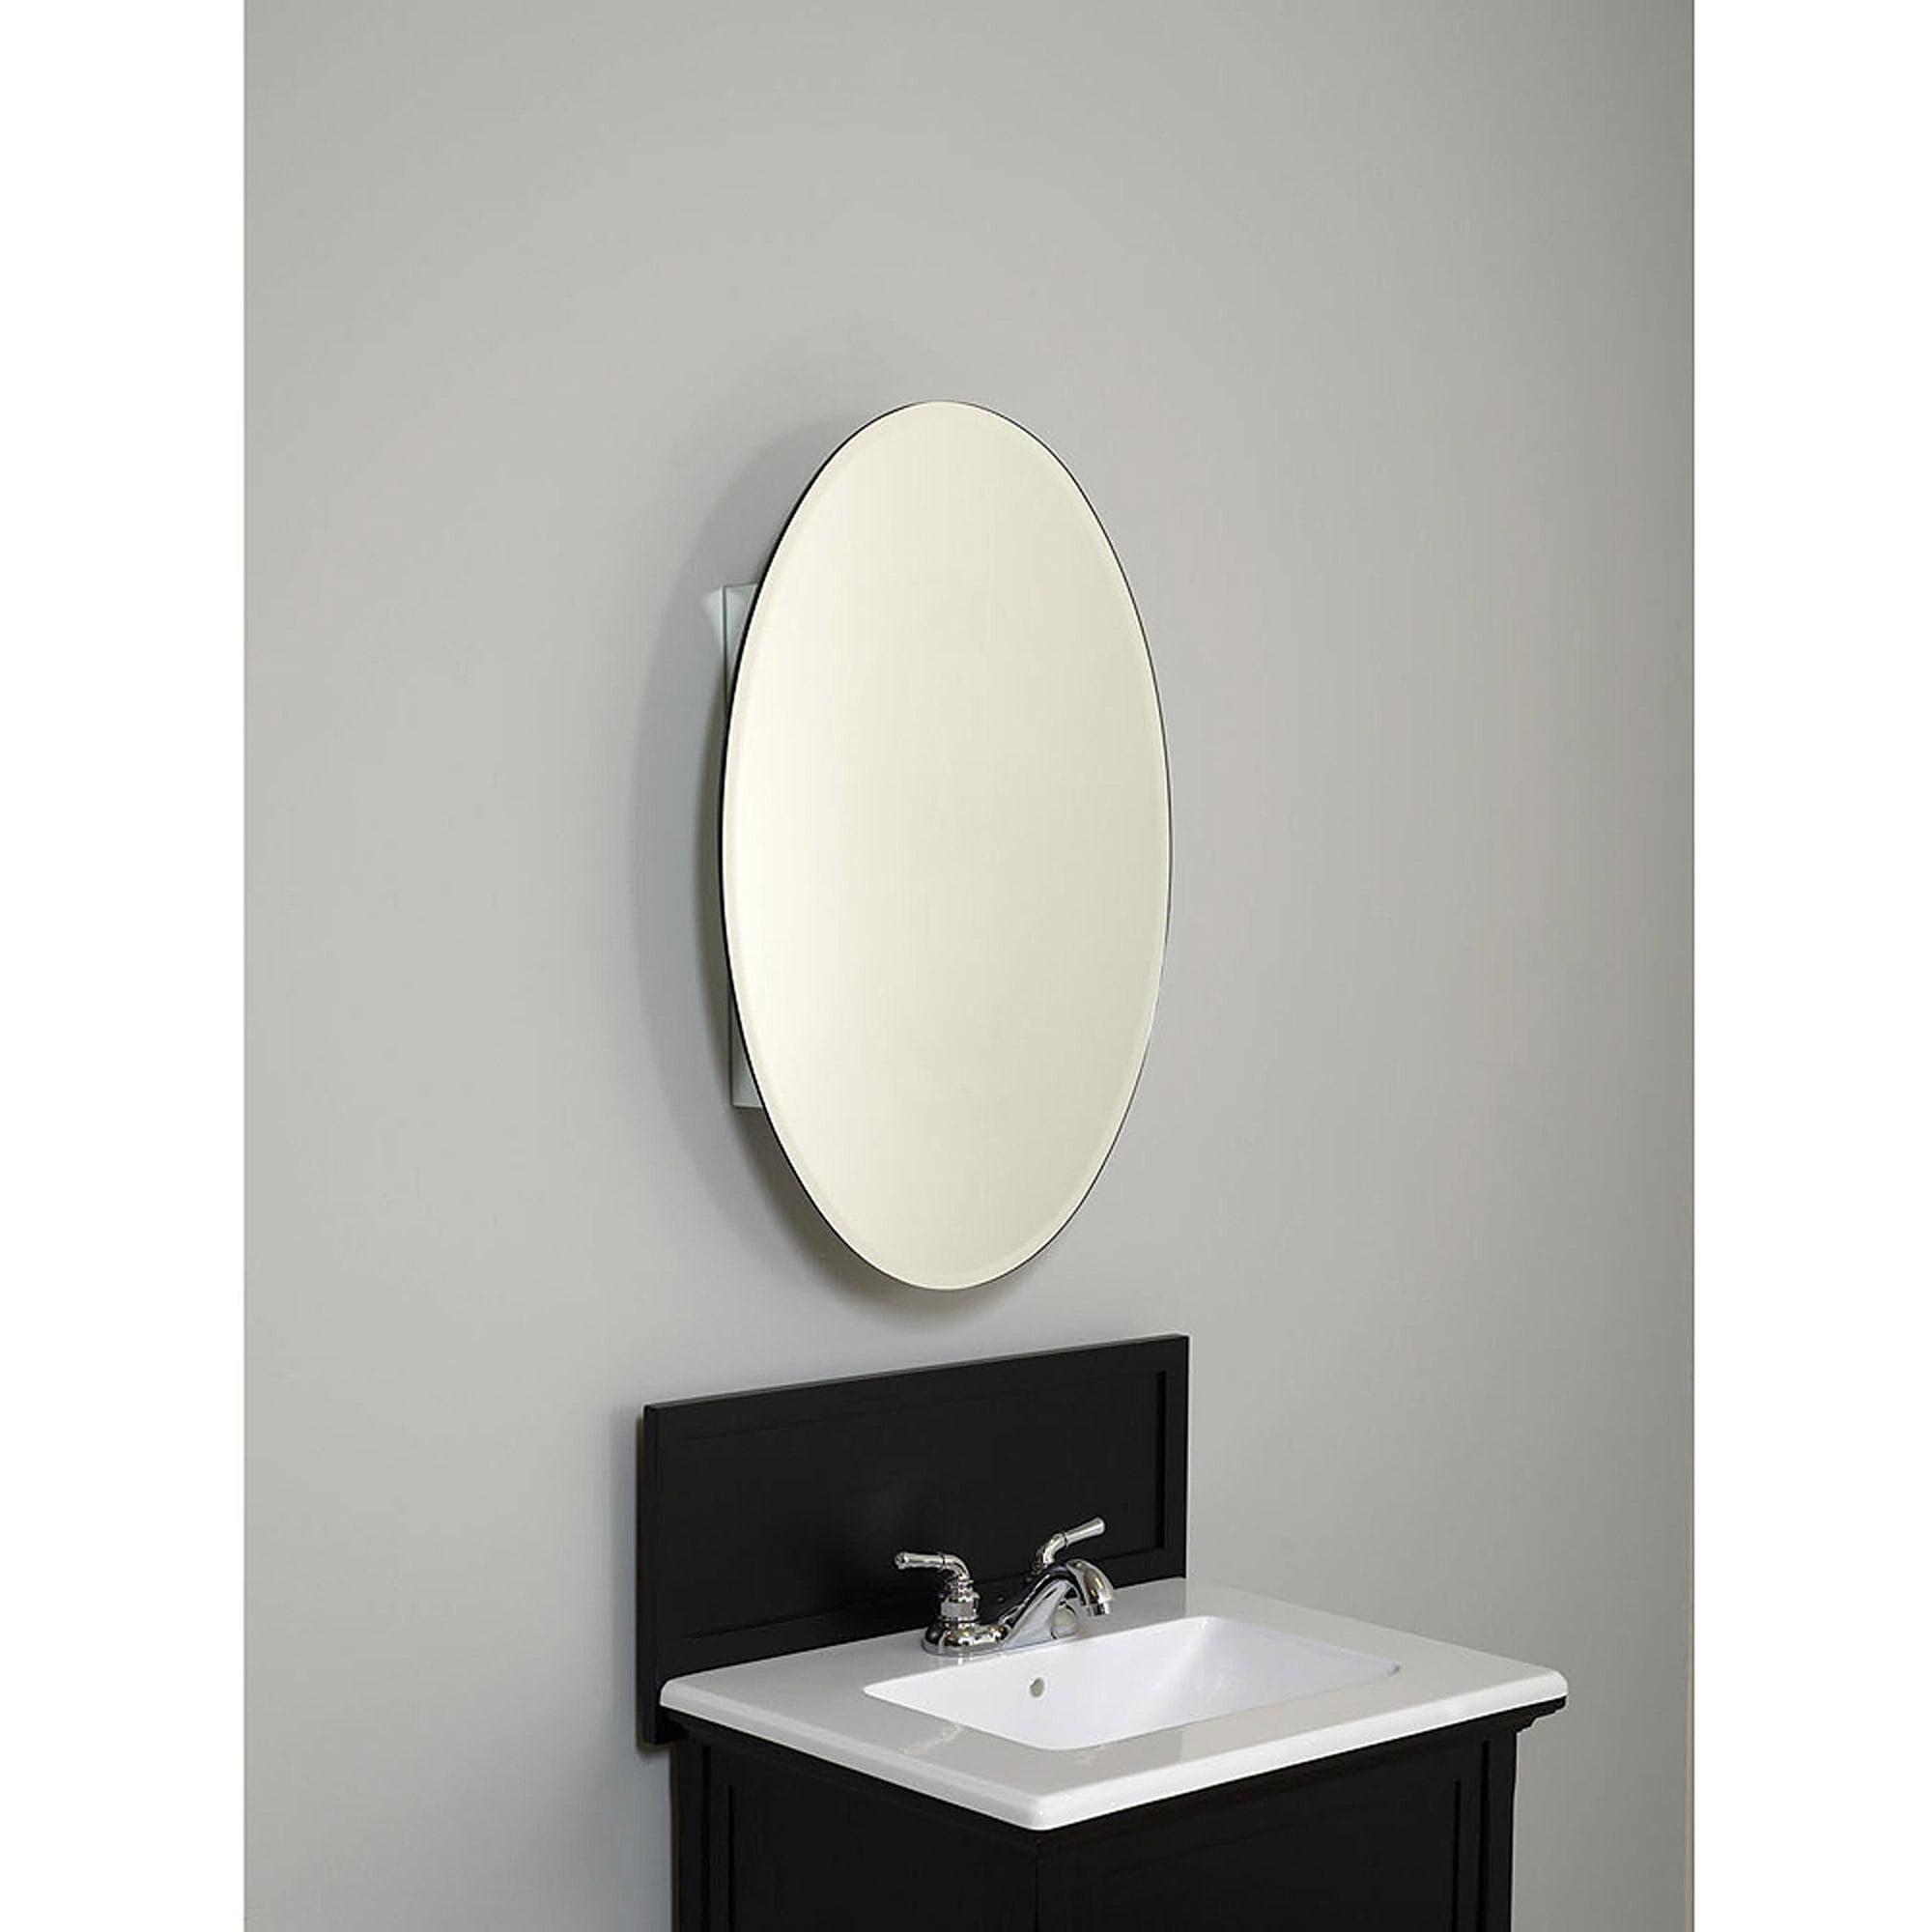 Designer Series Frameless Oval Medicine Cabinet Walmart